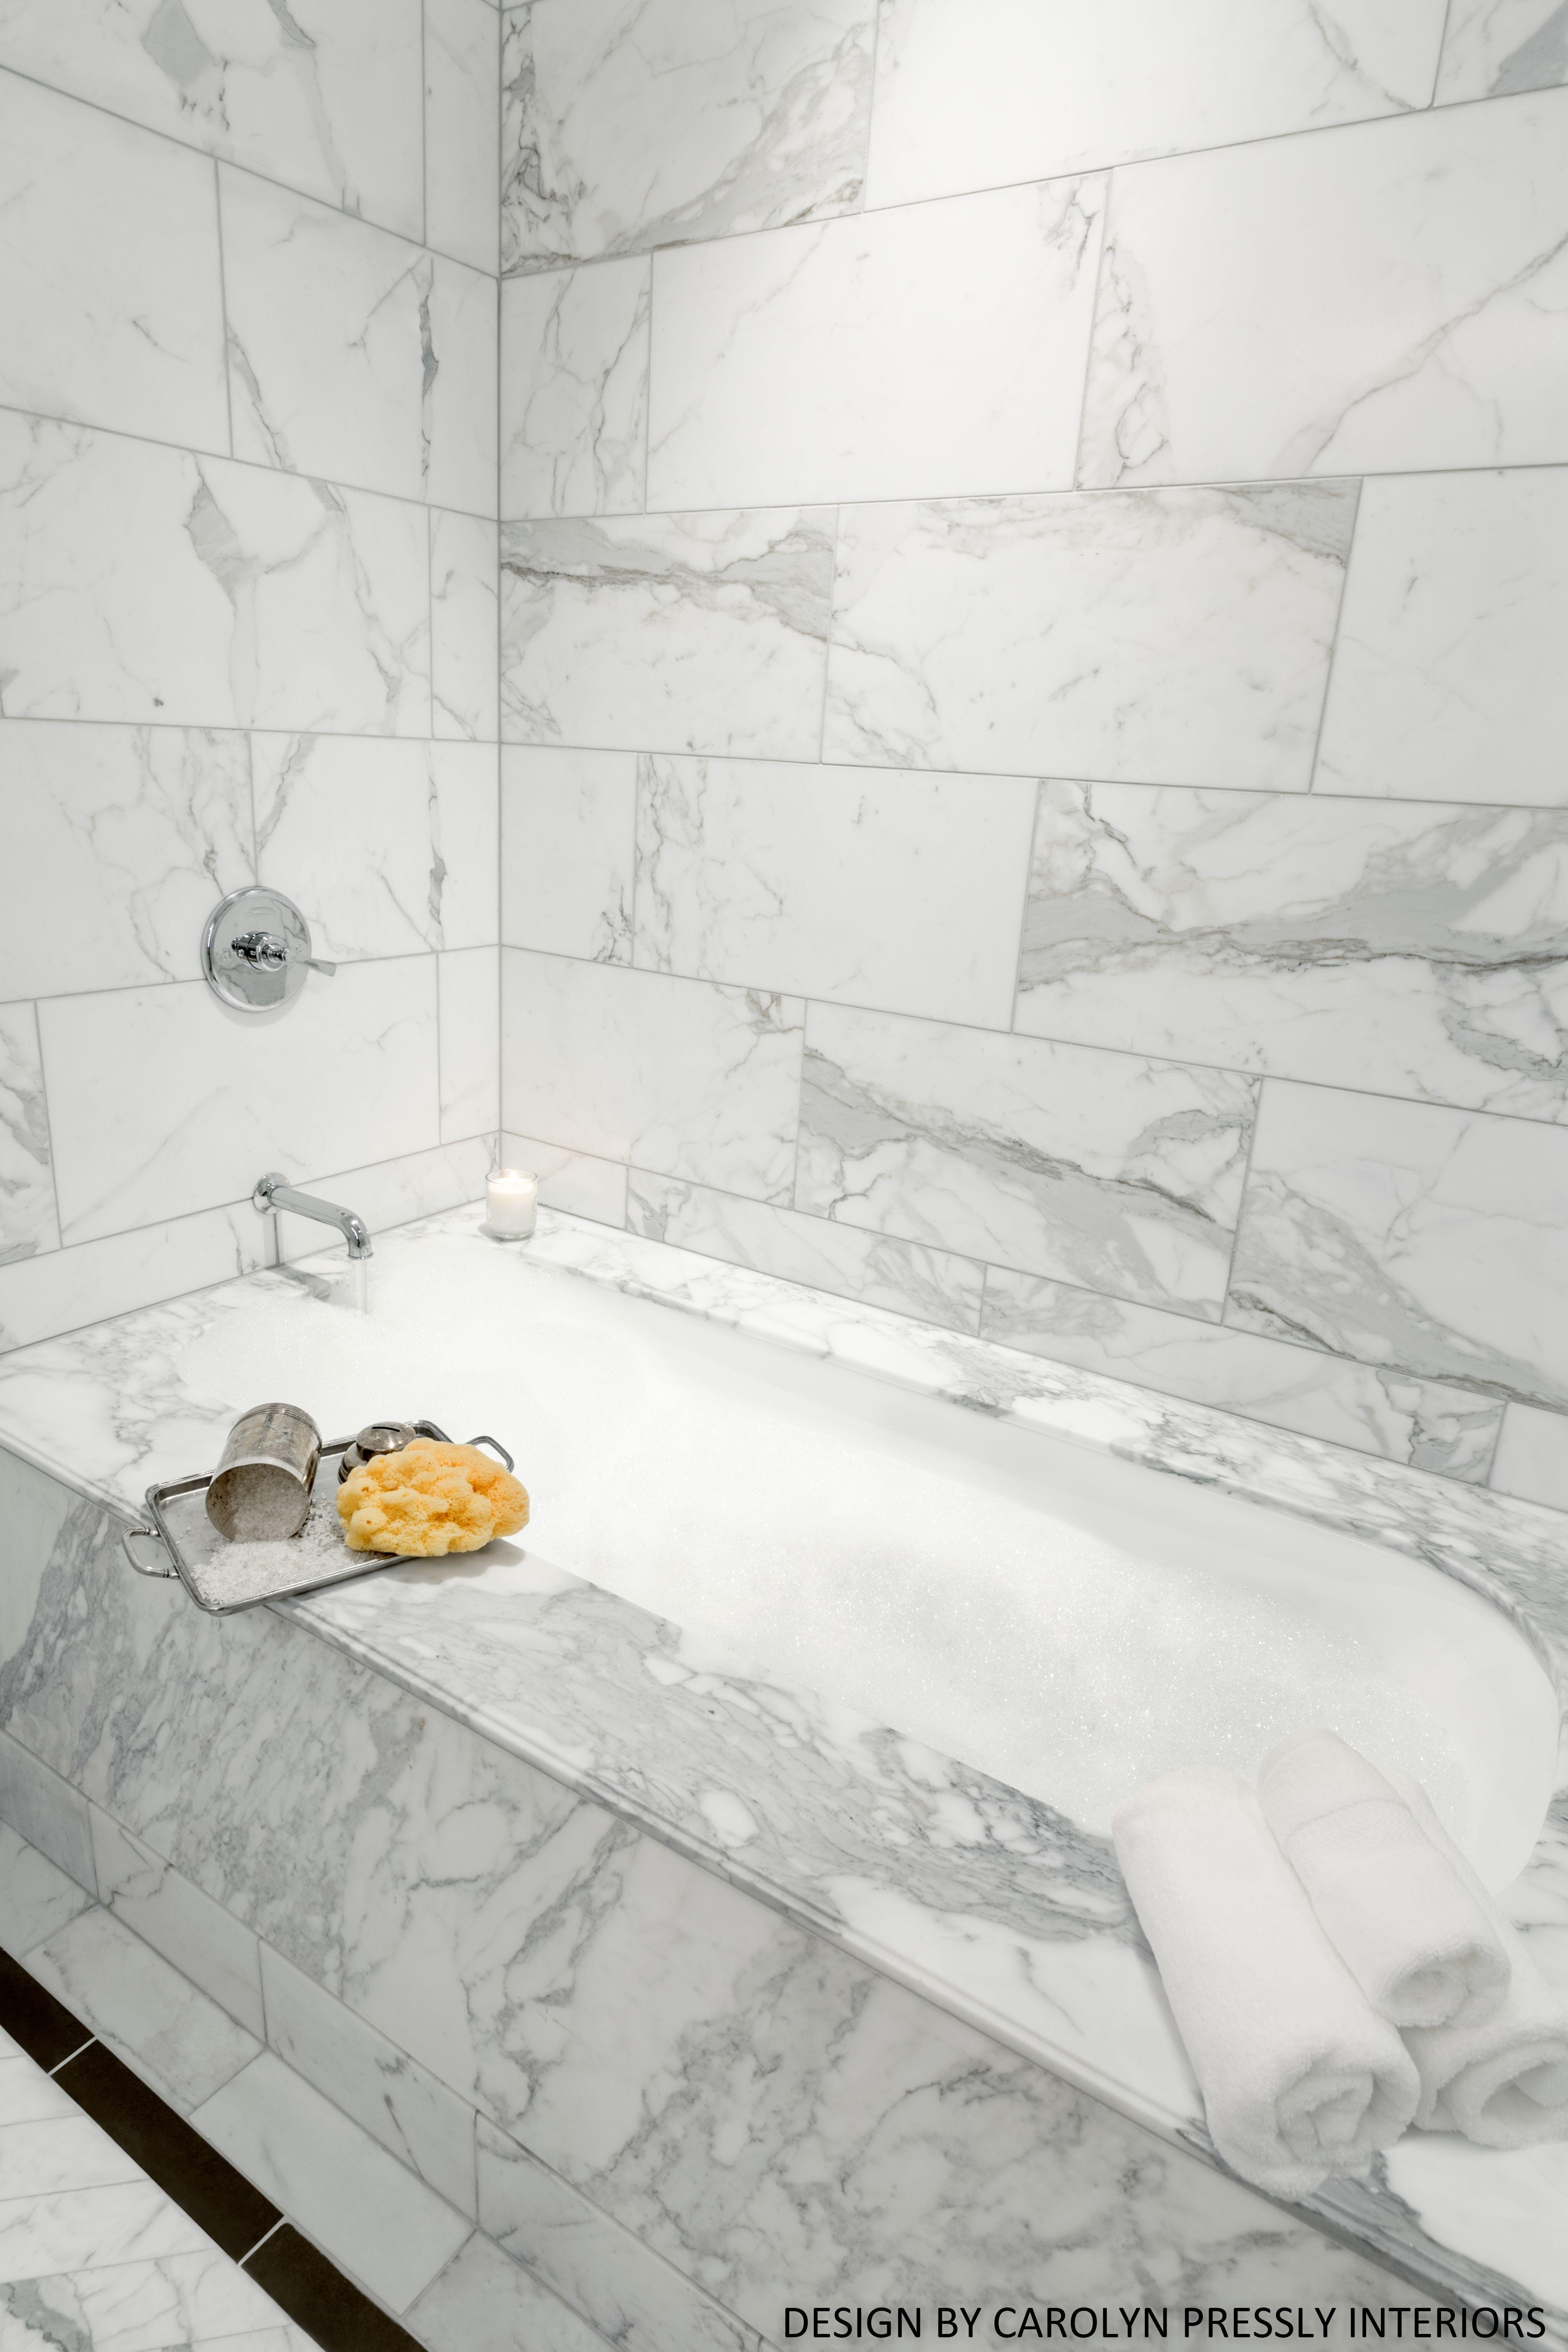 Jacuzzi Bathtub Marble Bathroom Designs Marble Tub Modern Marble Bathroom